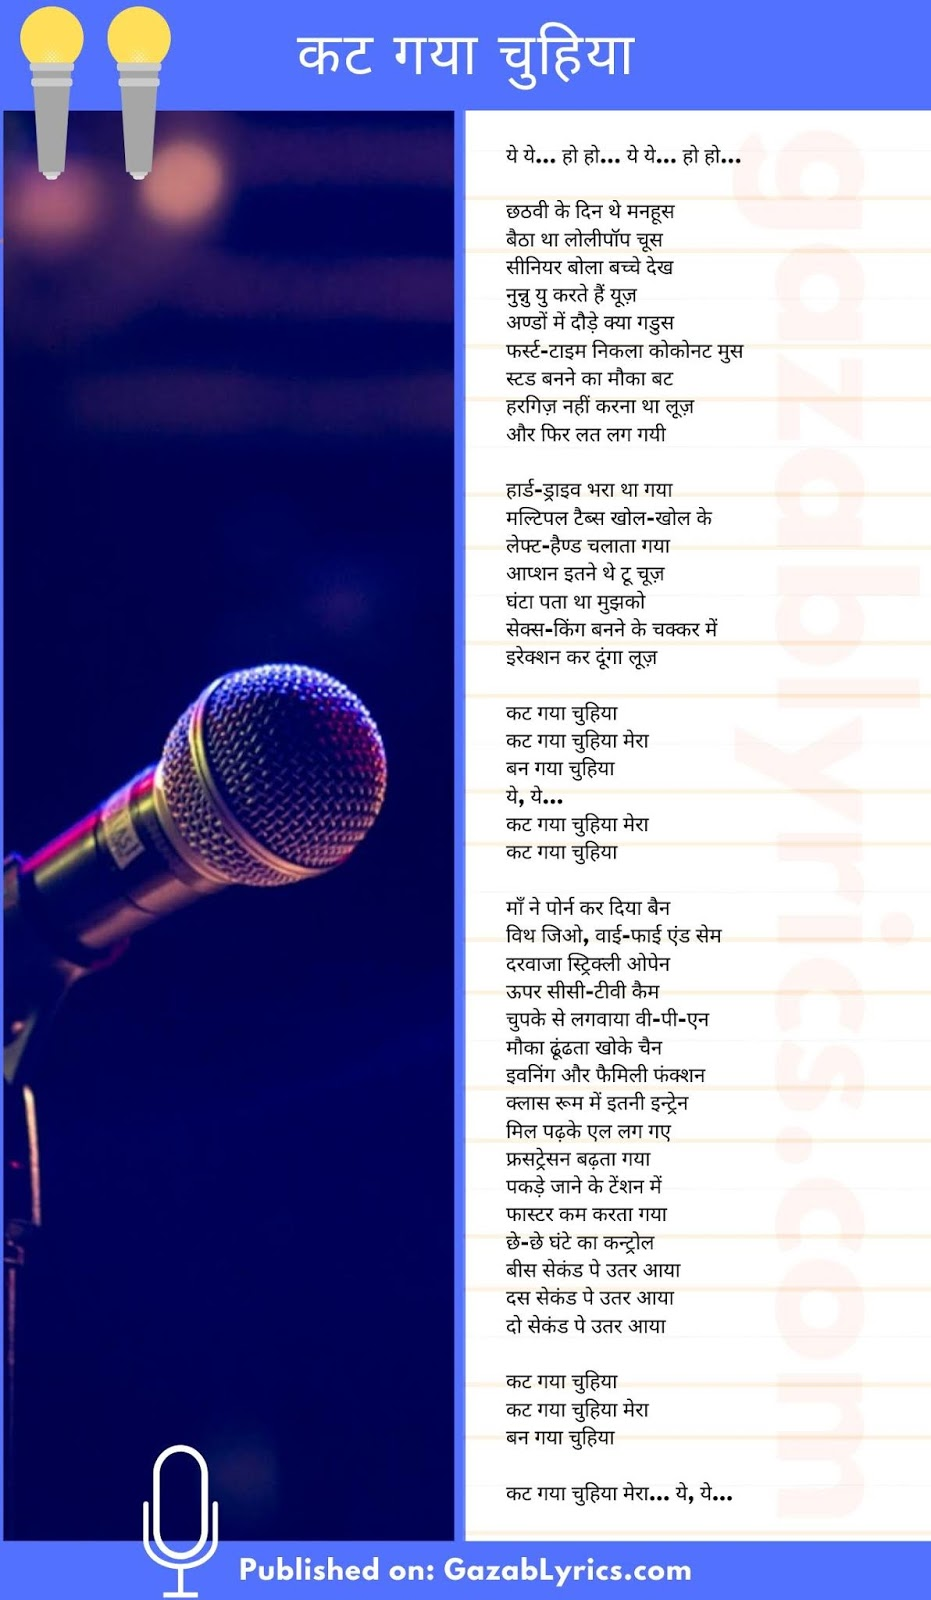 Kat Gaya Chuhiya song lyrics image